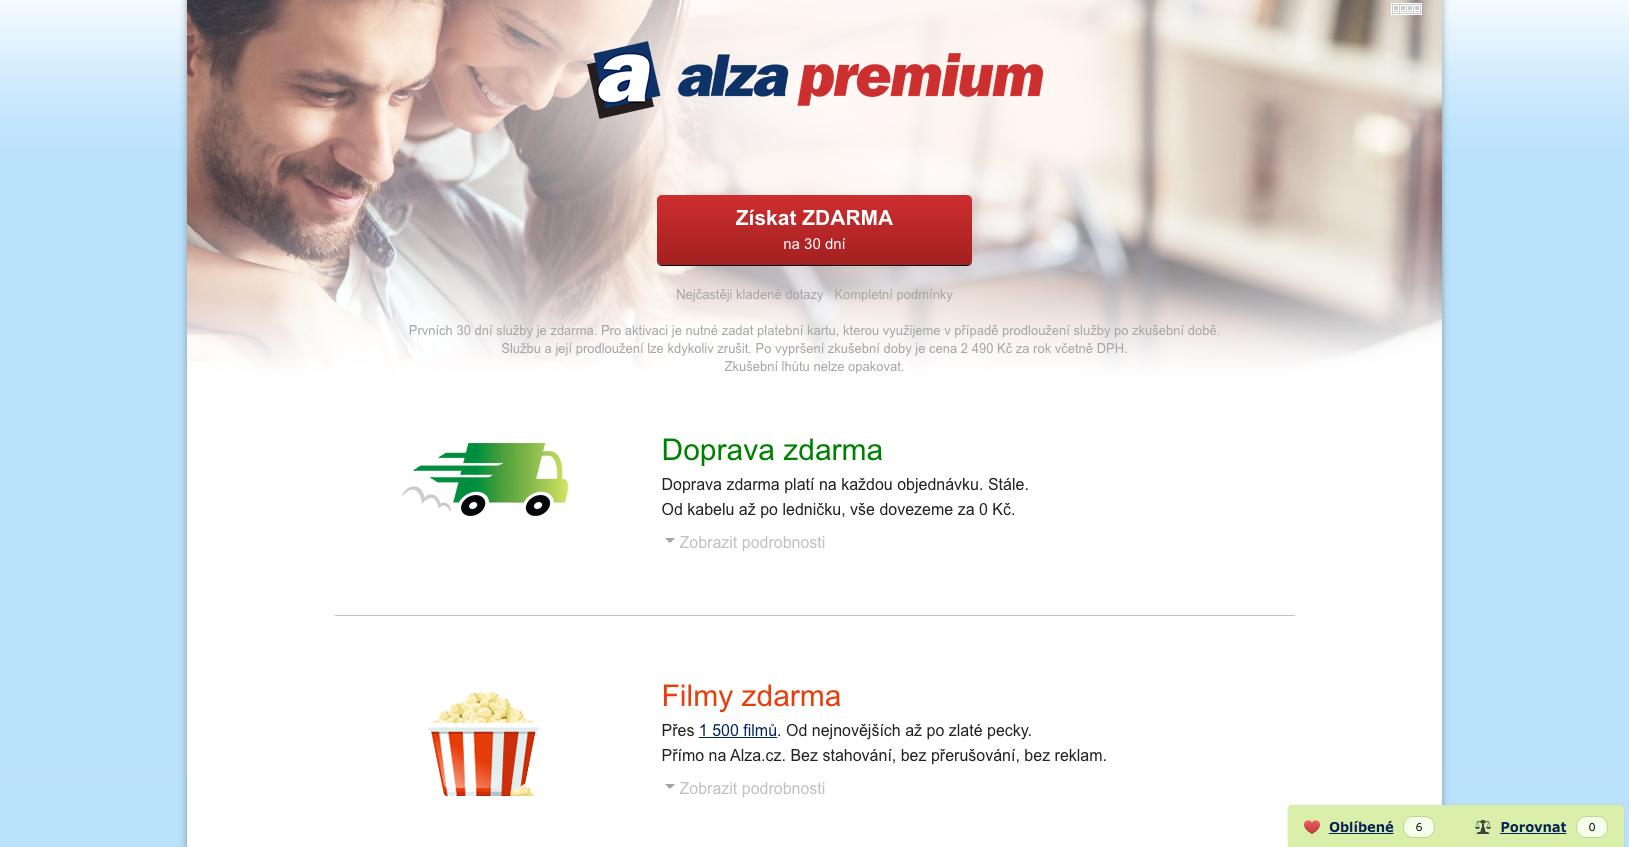 alza-p